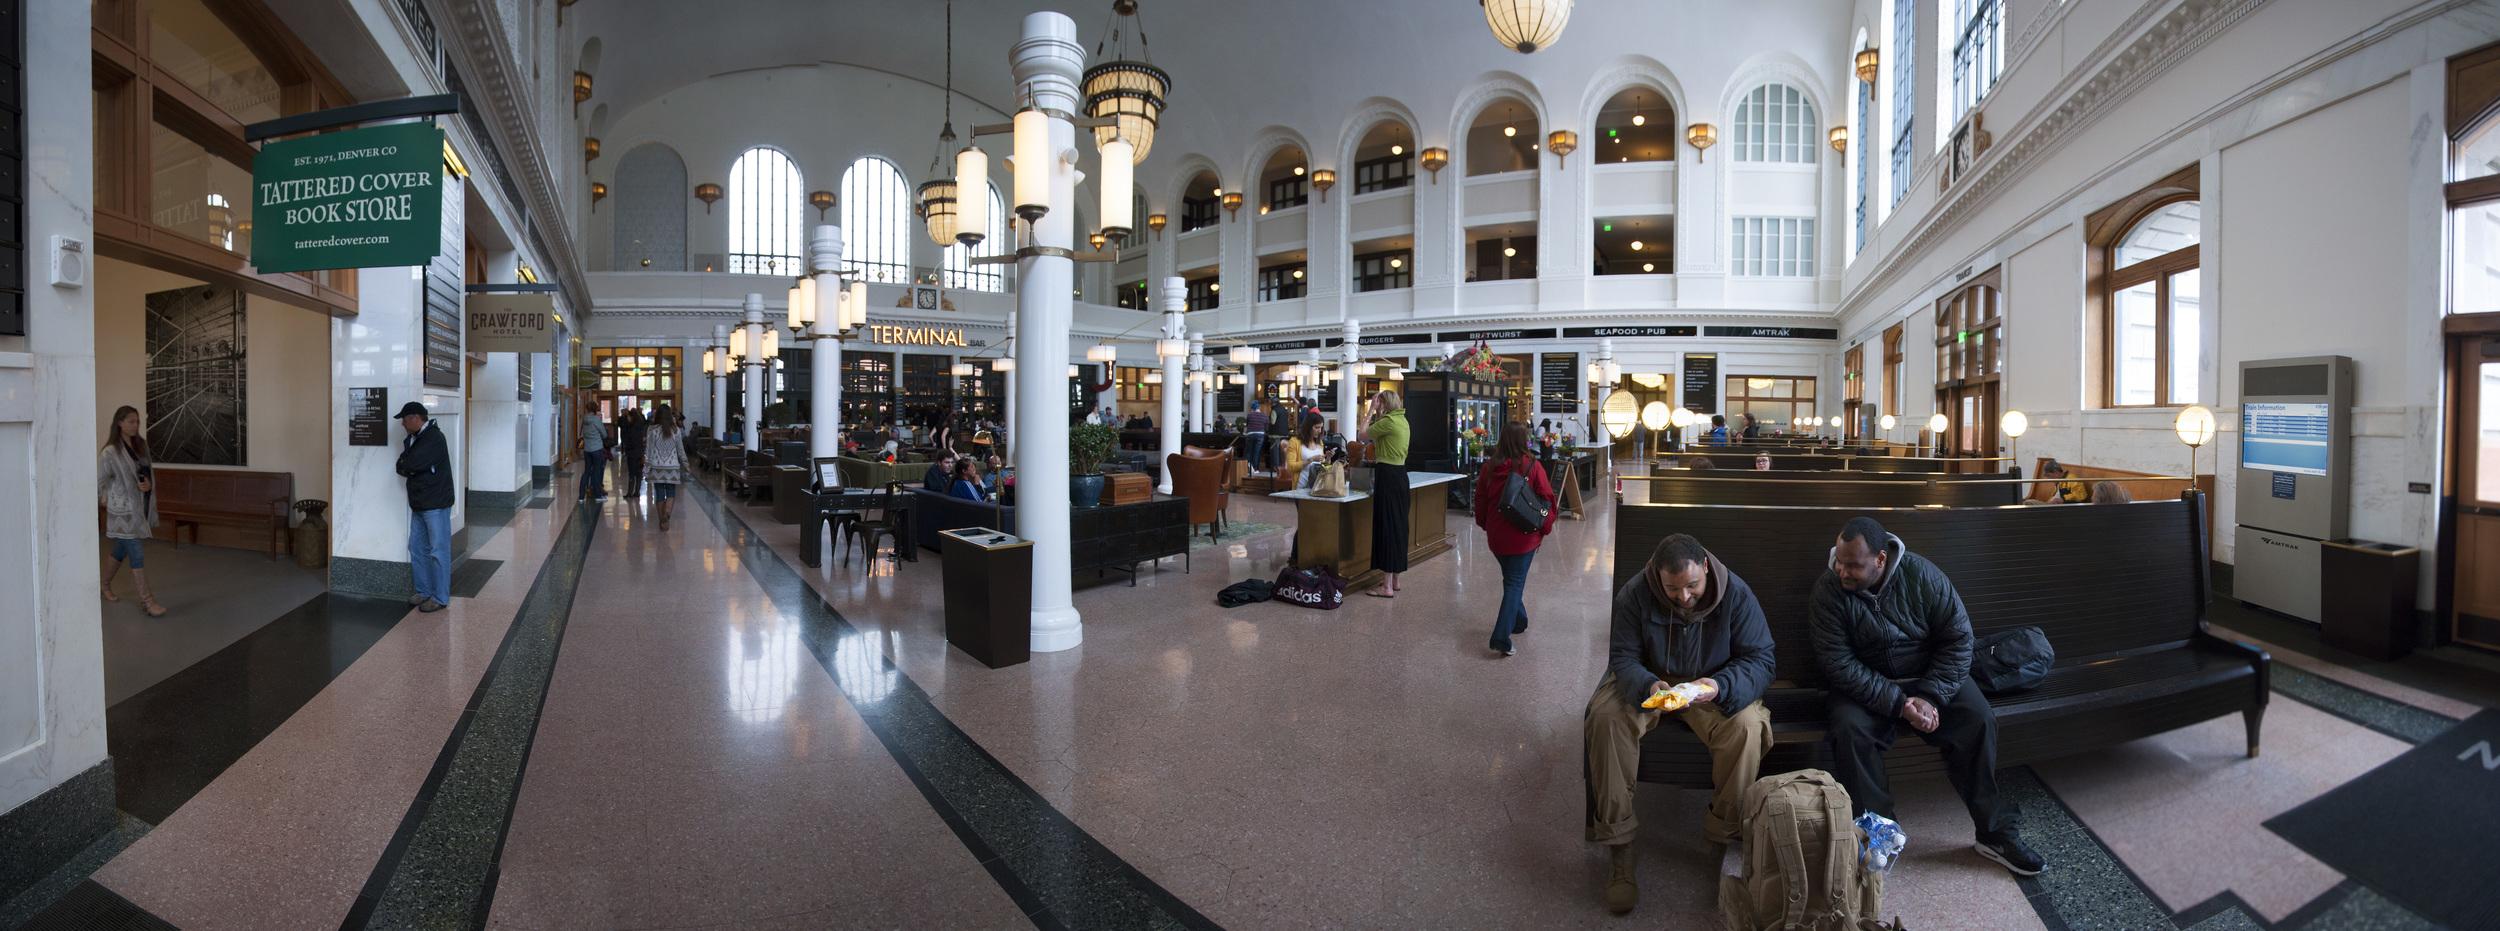 Union Station Great Hall / Denver, CO